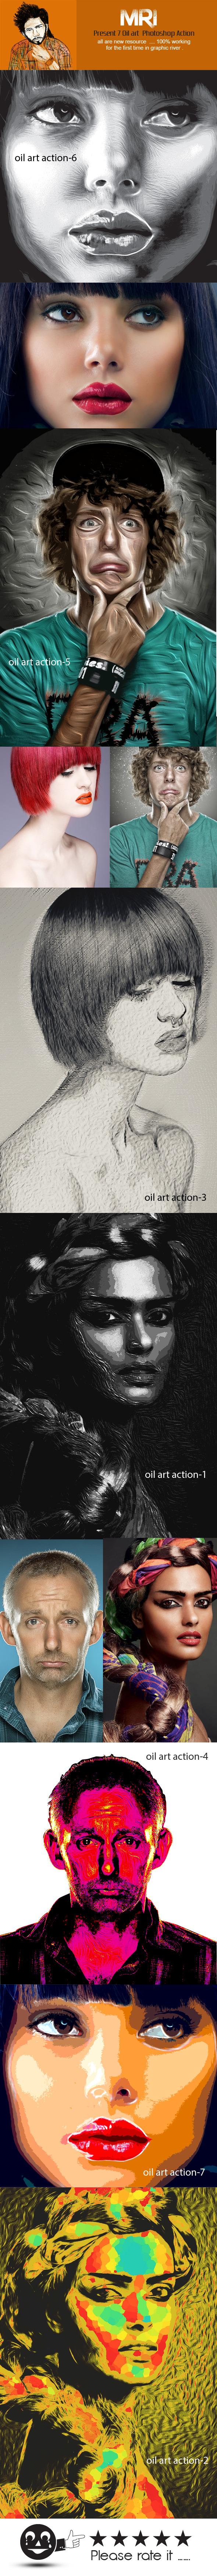 Pure Oil  Art  - Actions Photoshop